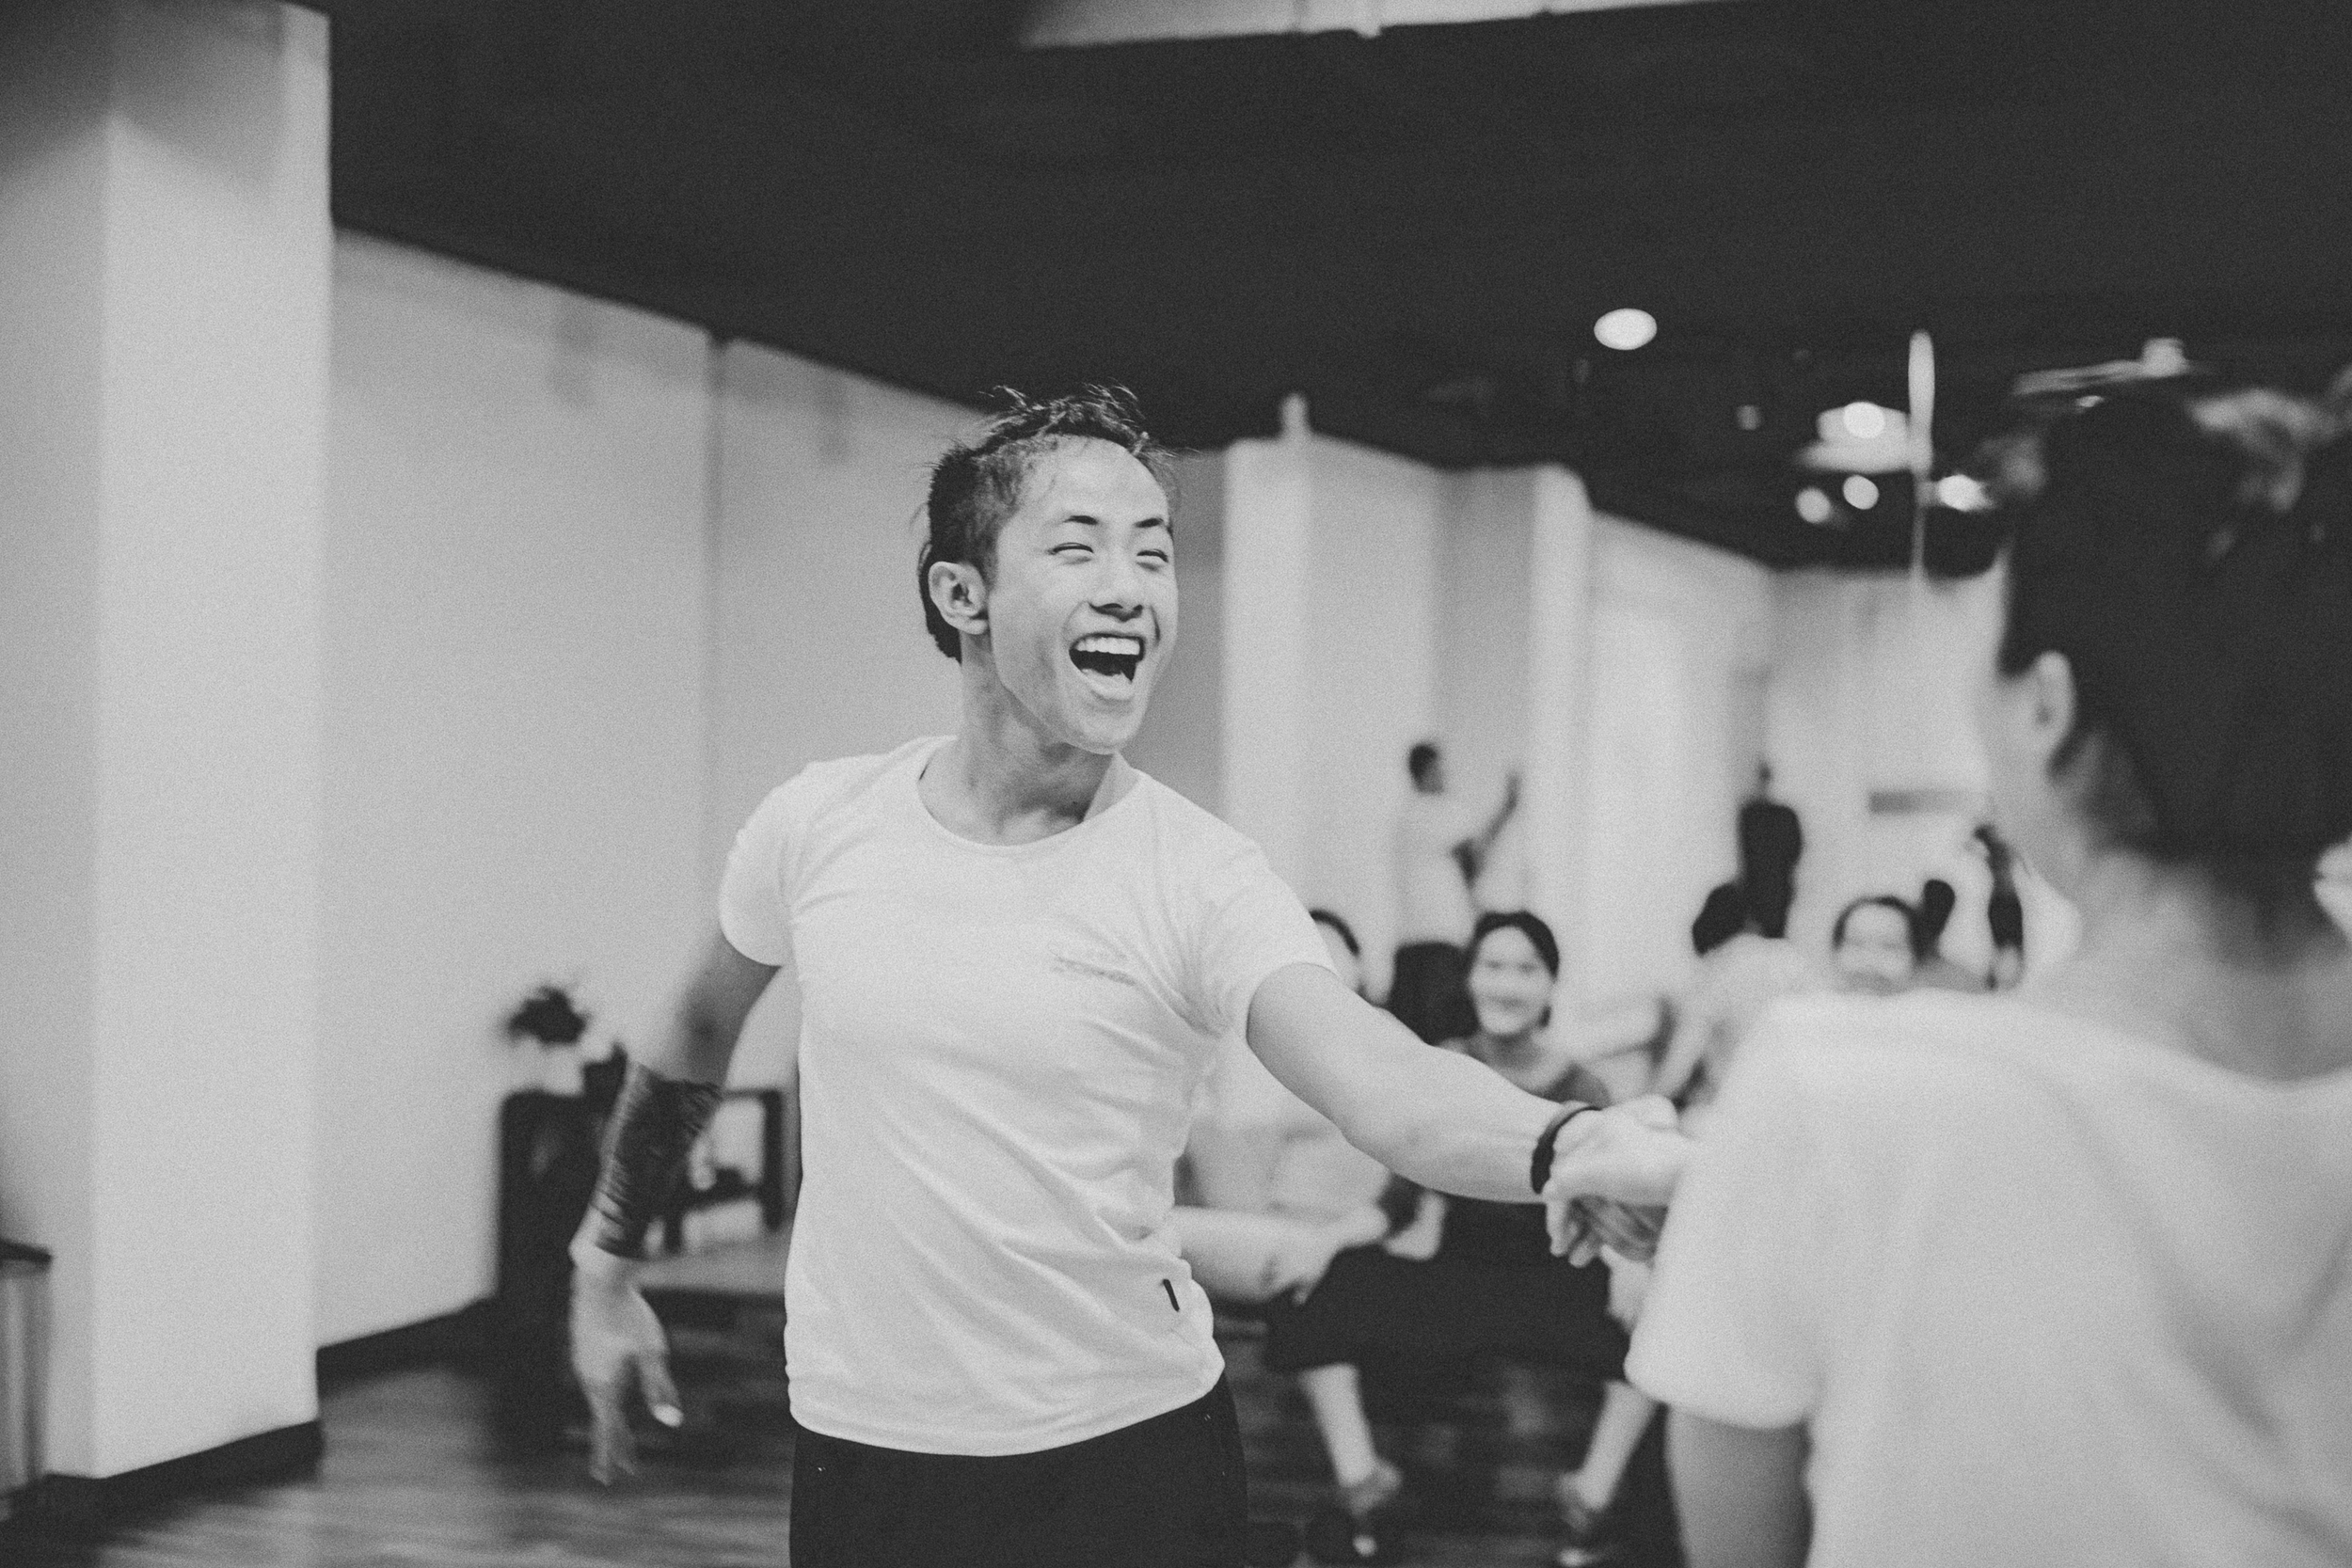 fusion_shanghai_salsa_behindthescenes_jkblackwell-30.jpg